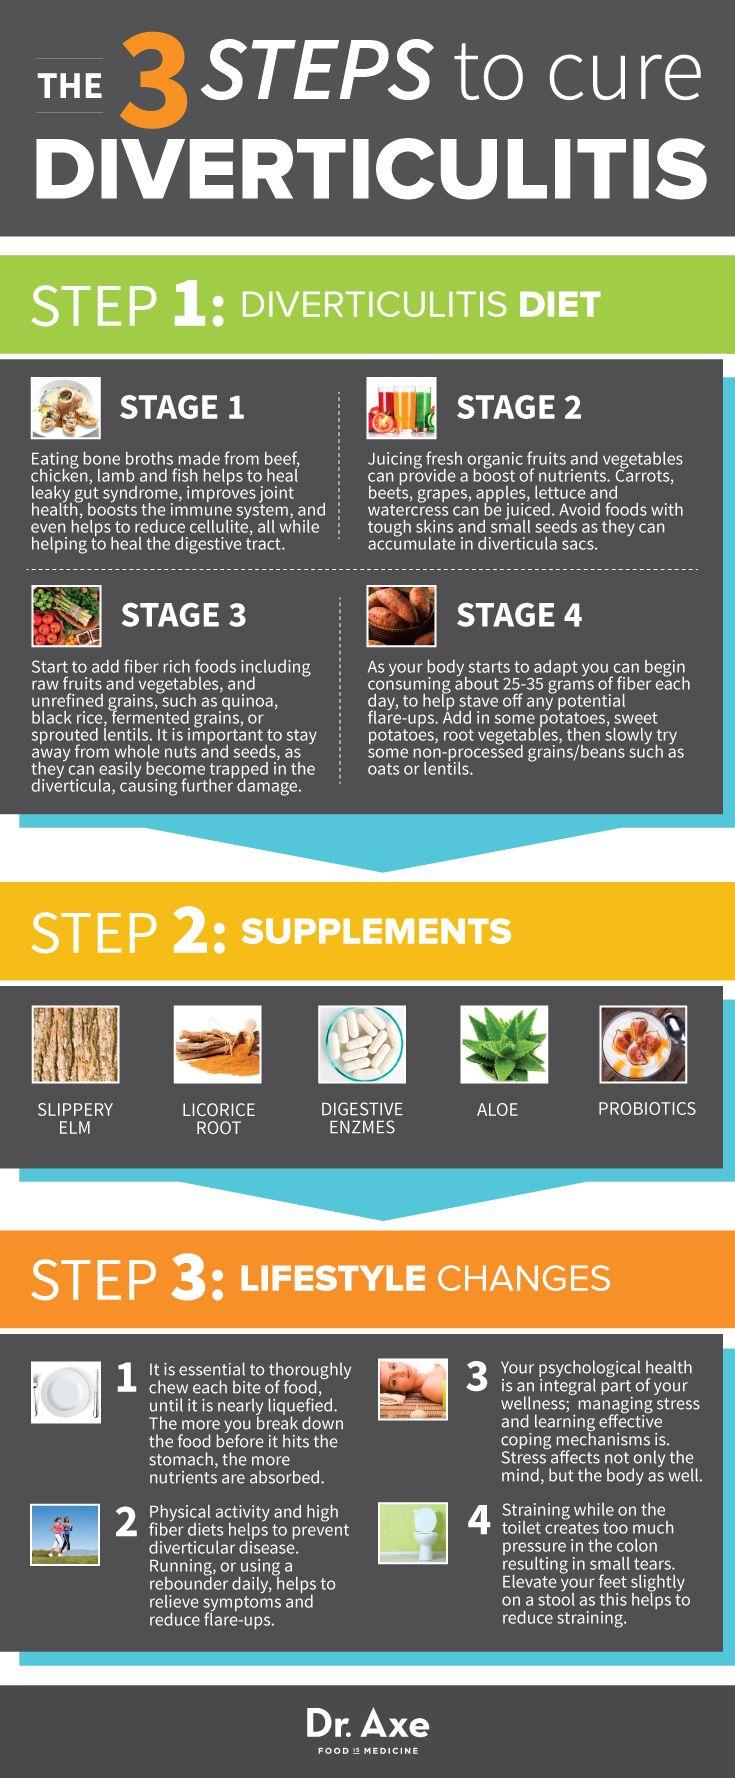 Diverticulitis Diet Cure